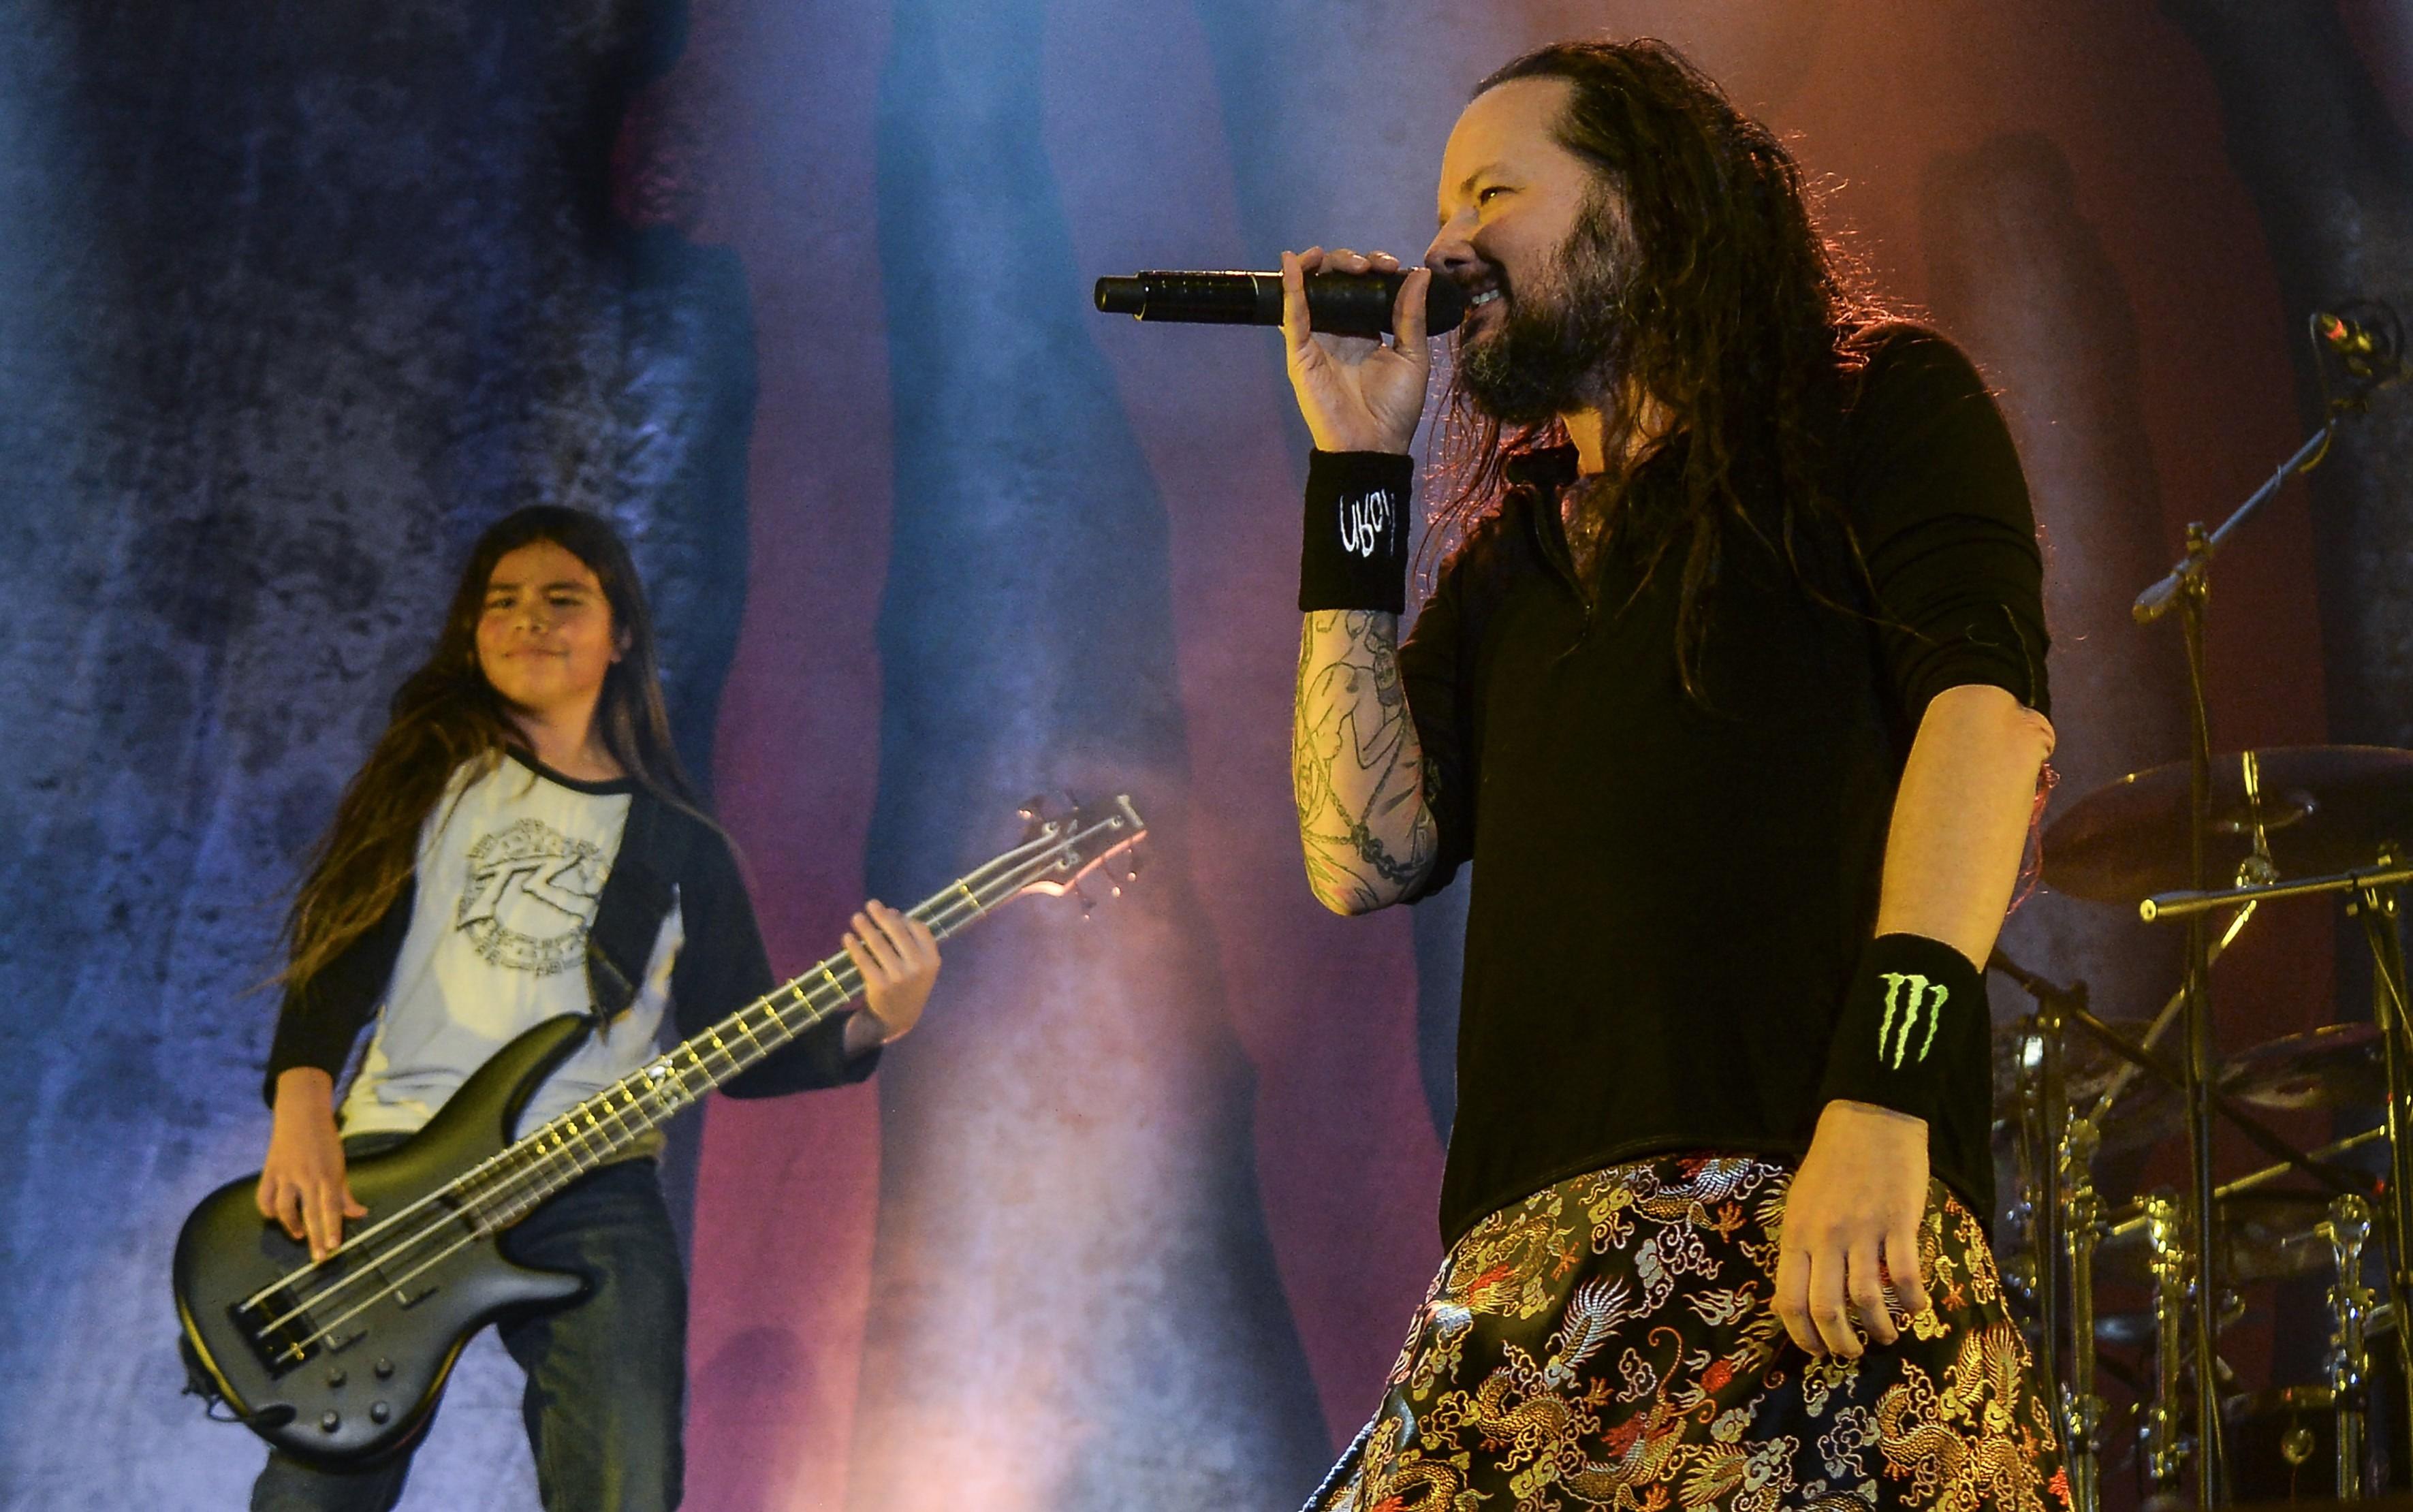 Jonathan Davis and Tye Trujillo of Korn perform in Bogota on April 17, 2017.